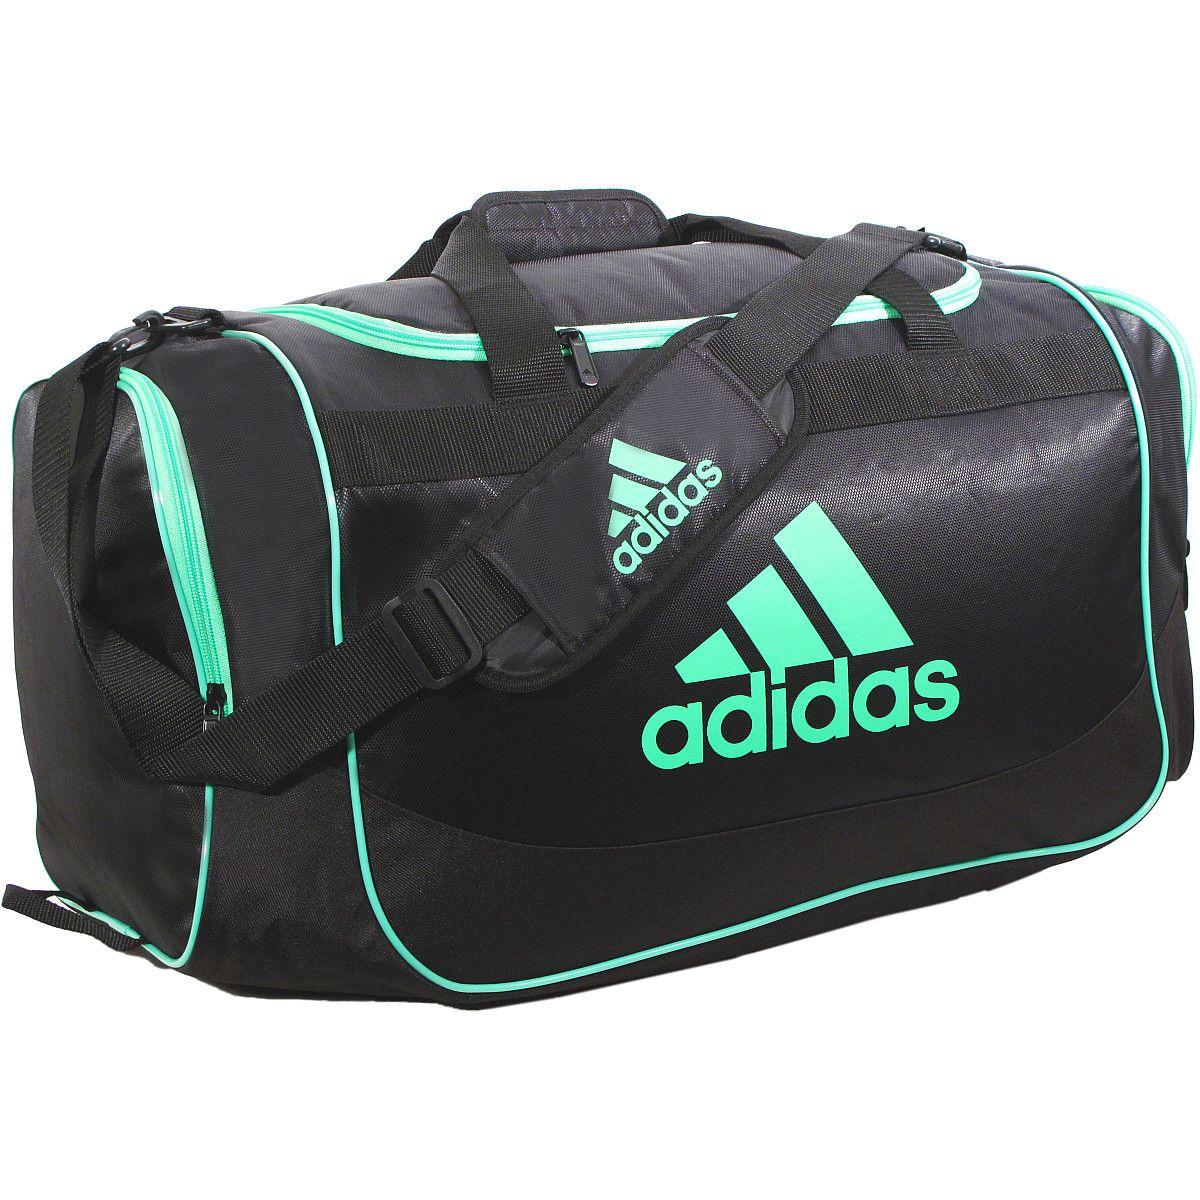 adidas Defender Duffle Bag - Medium - SportsAuthority.com